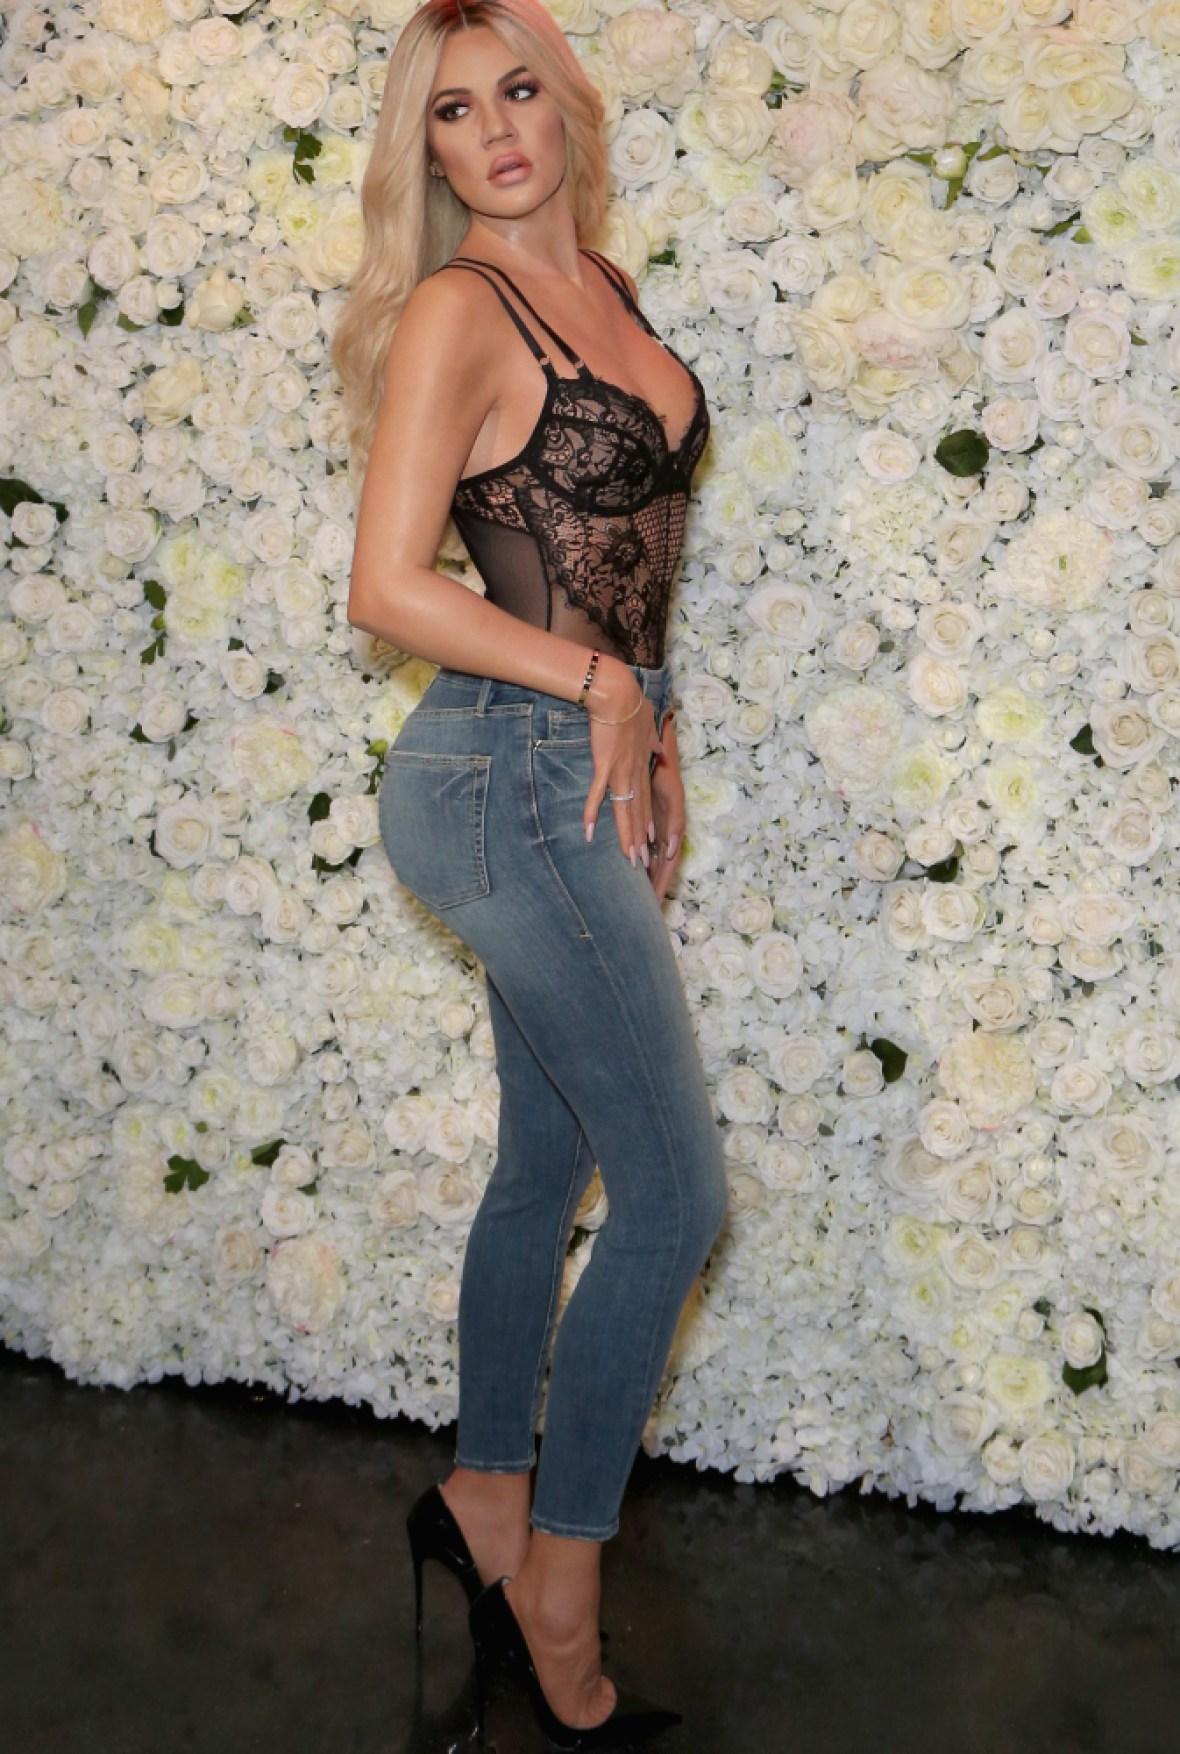 khloe kardashian wax figure